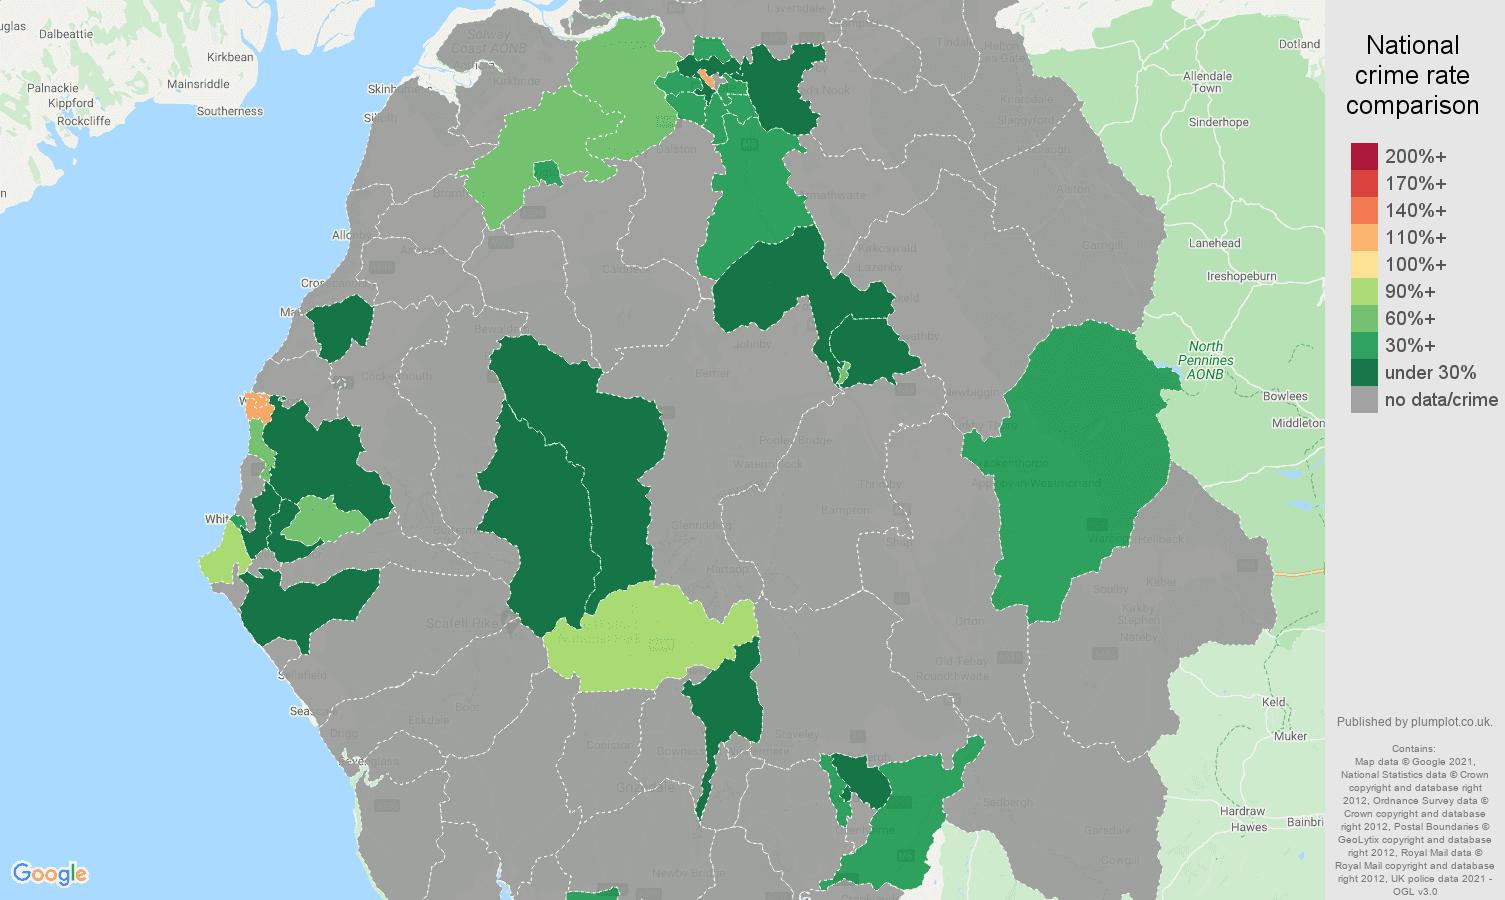 Cumbria robbery crime rate comparison map